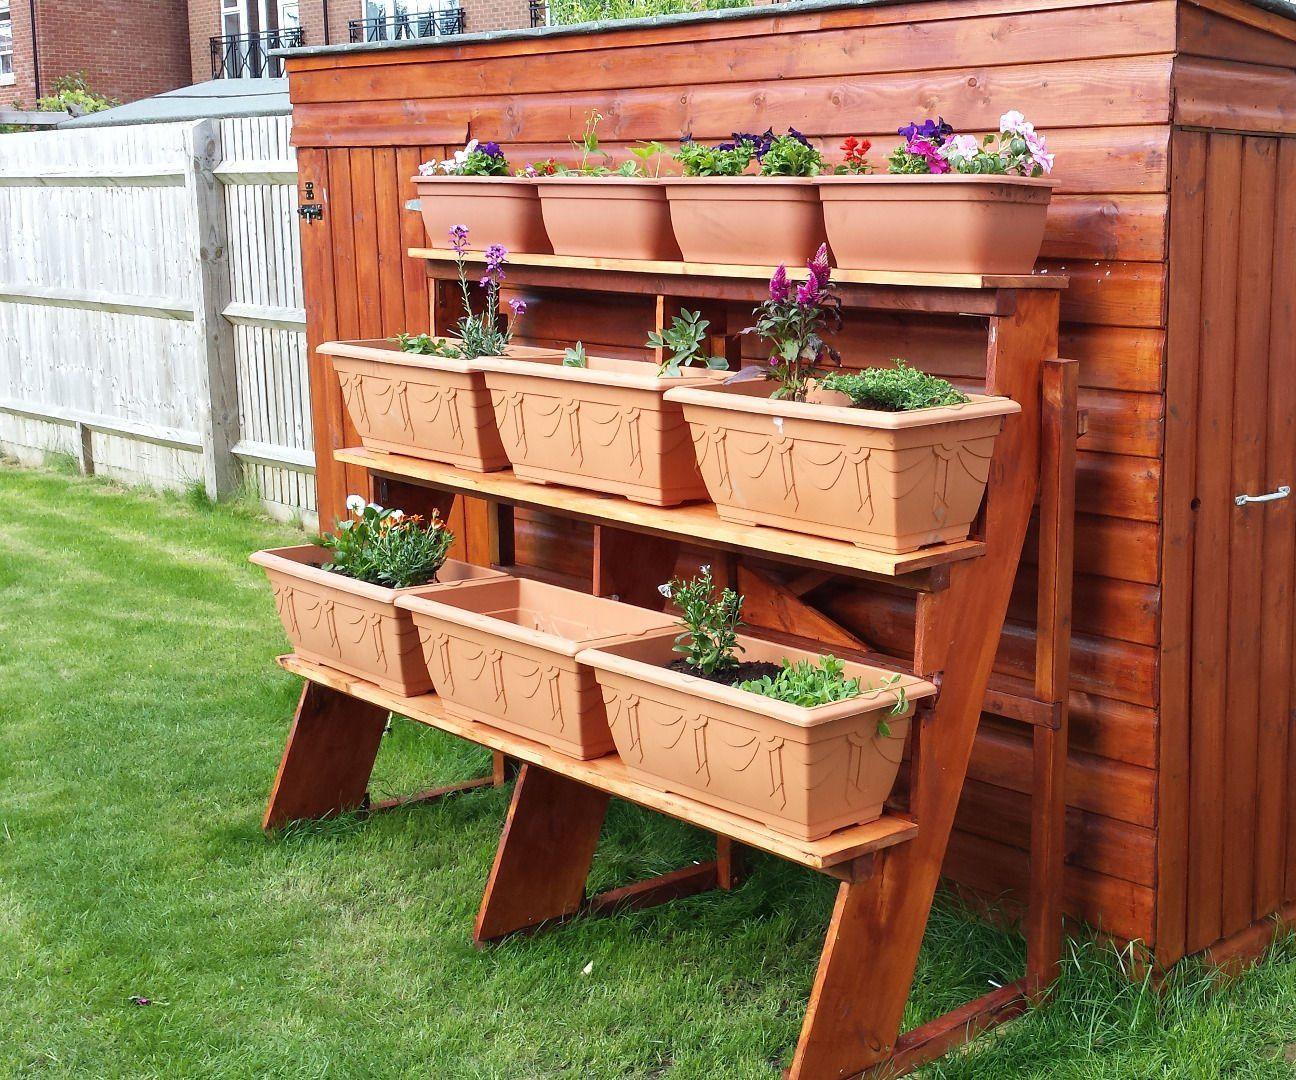 Garden Beds, Raised Garden Beds, Pallets